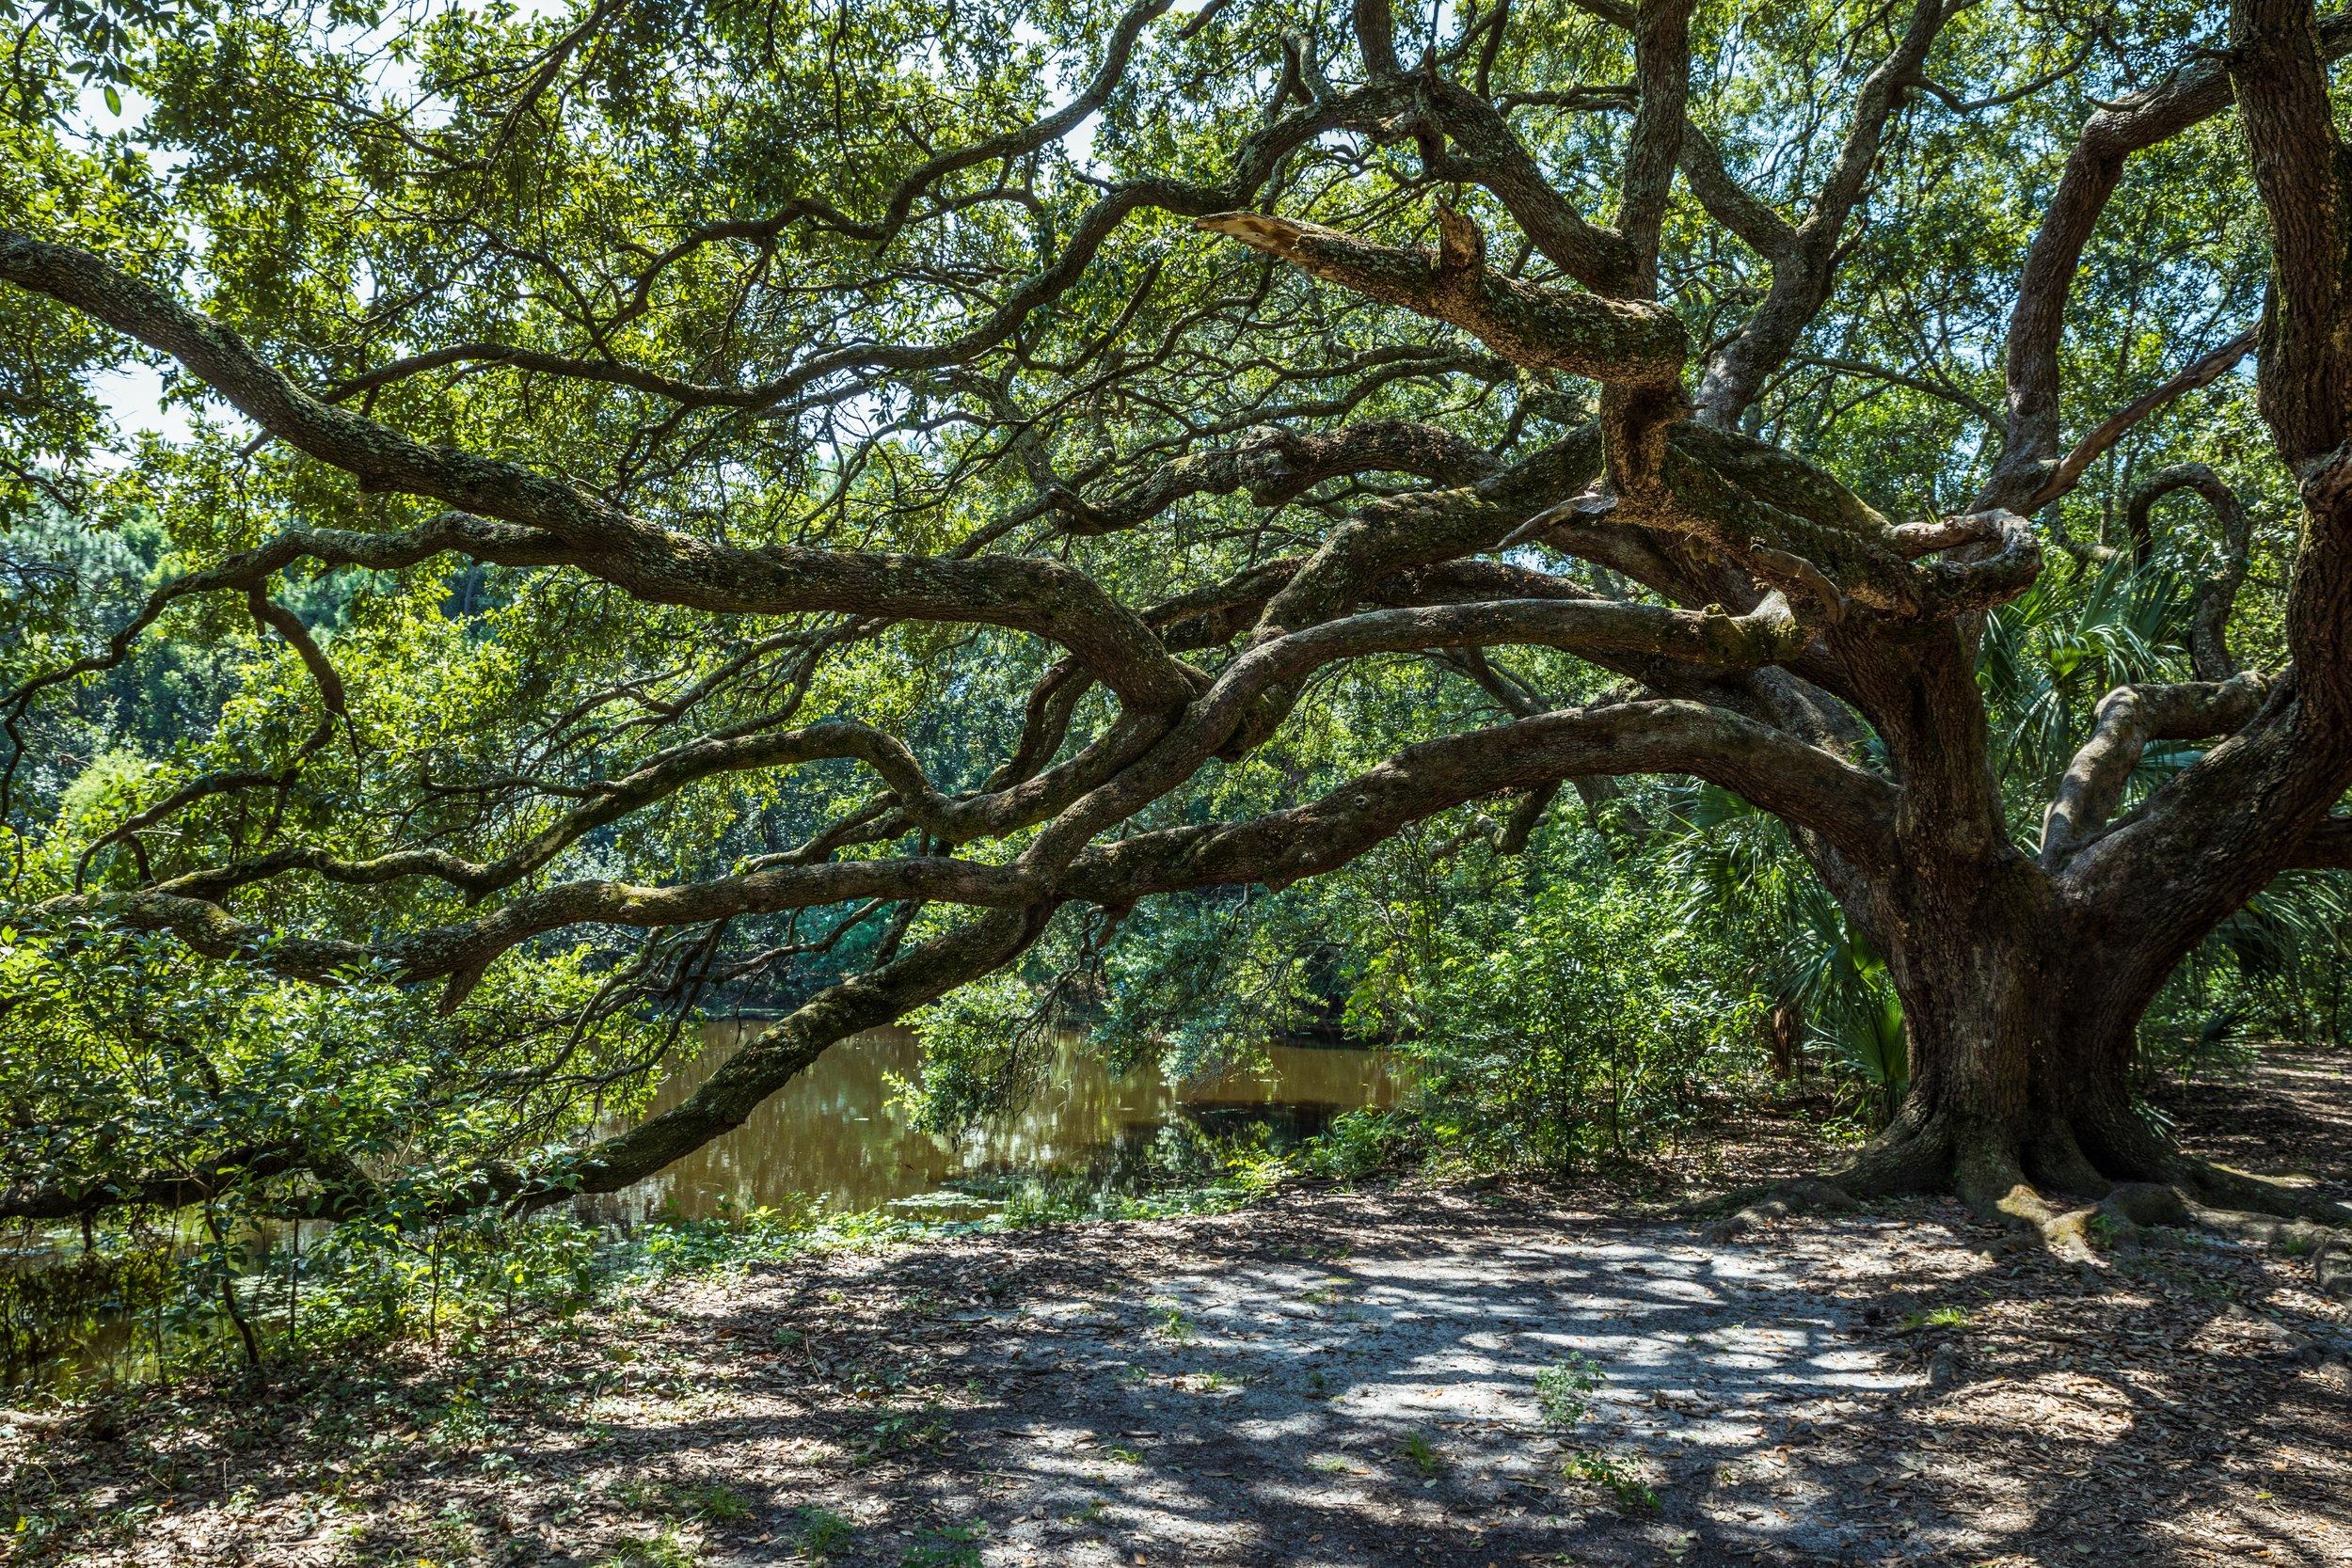 Nature's Tangle